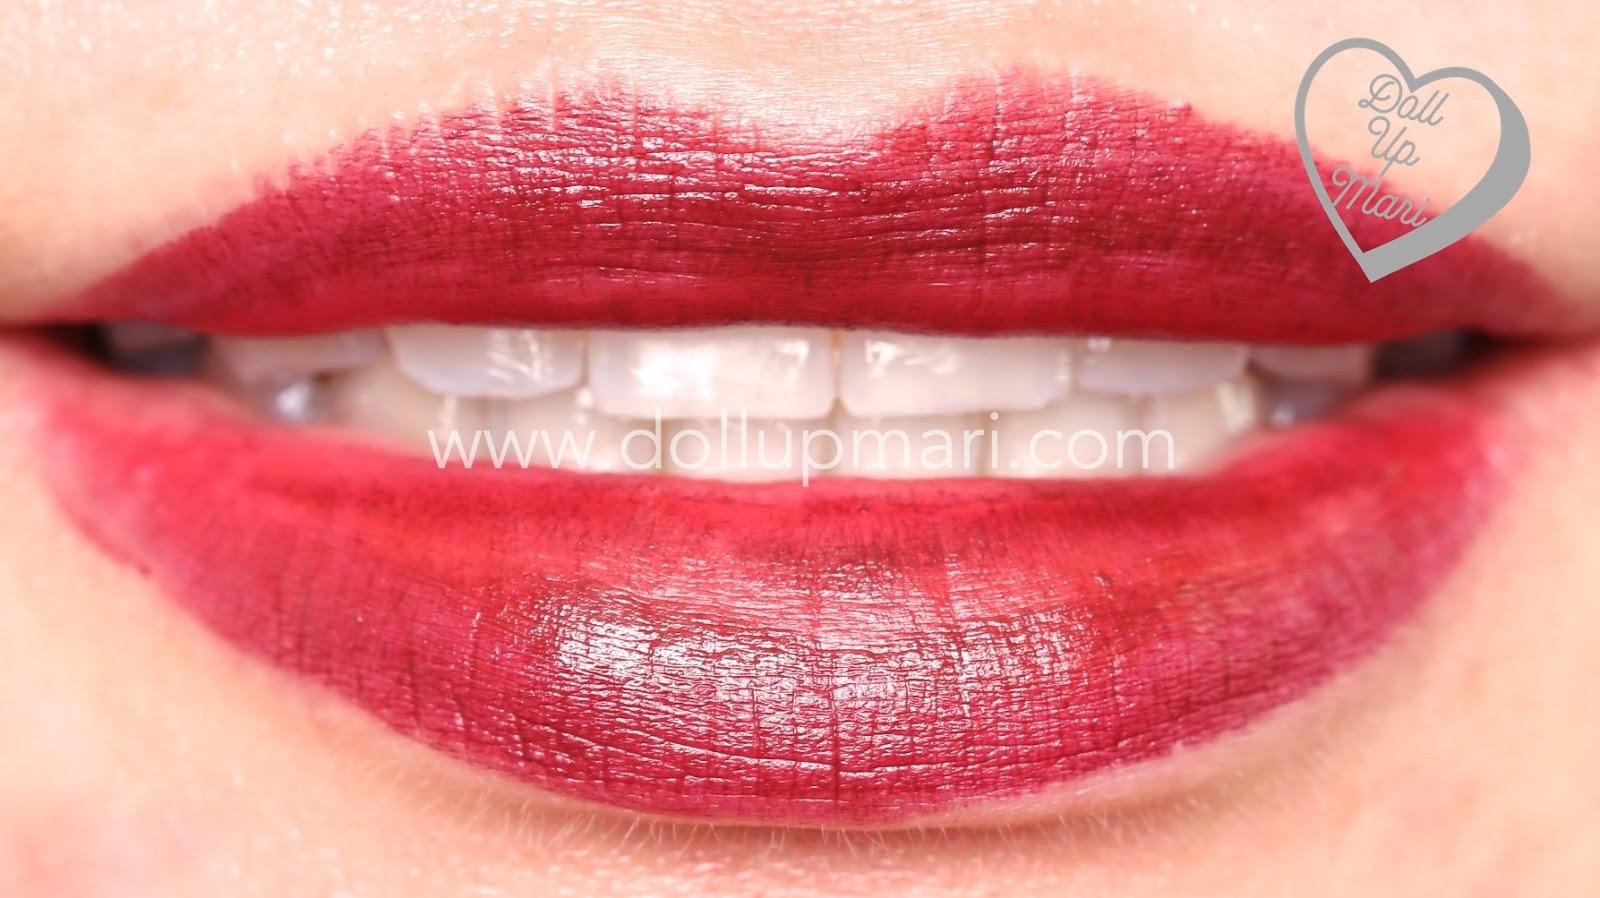 lip swatch of Superb Wine shade of AVON Perfectly Matte Lipstick